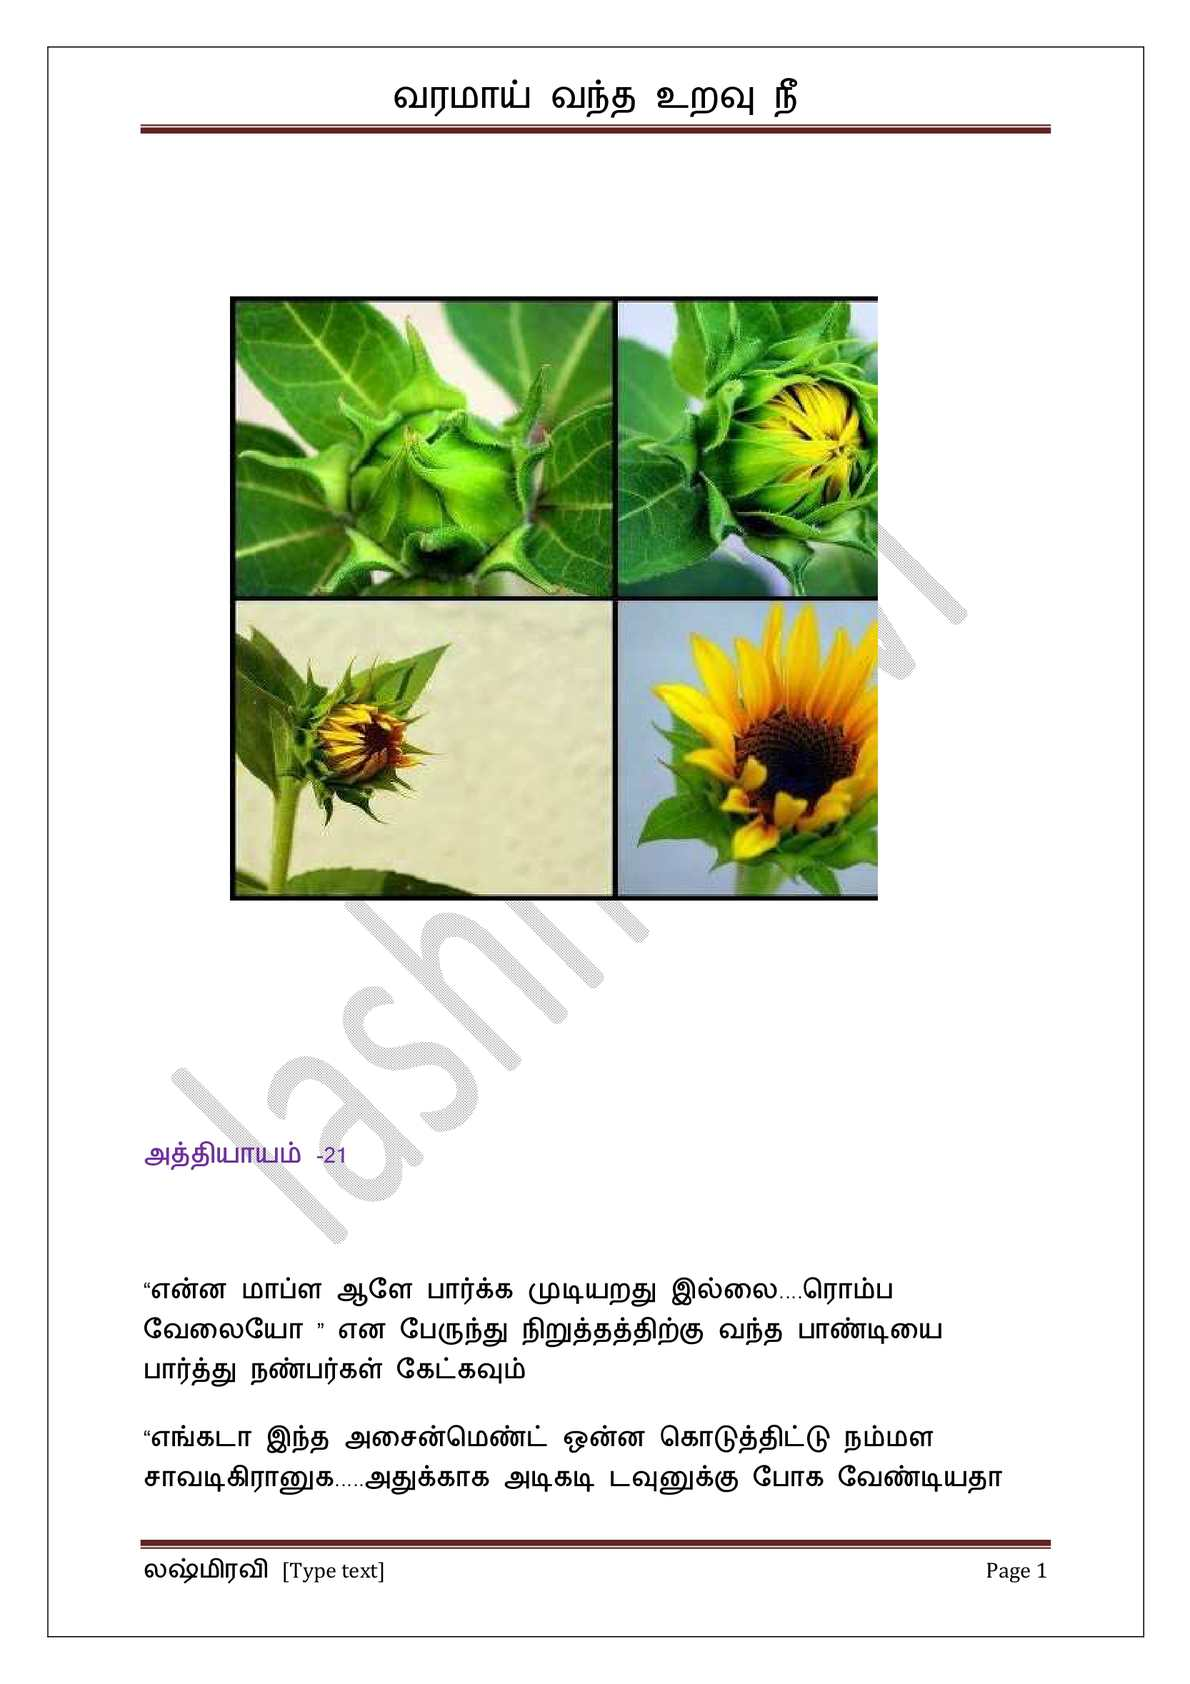 Varamaai Vantha Uravu Nee 21